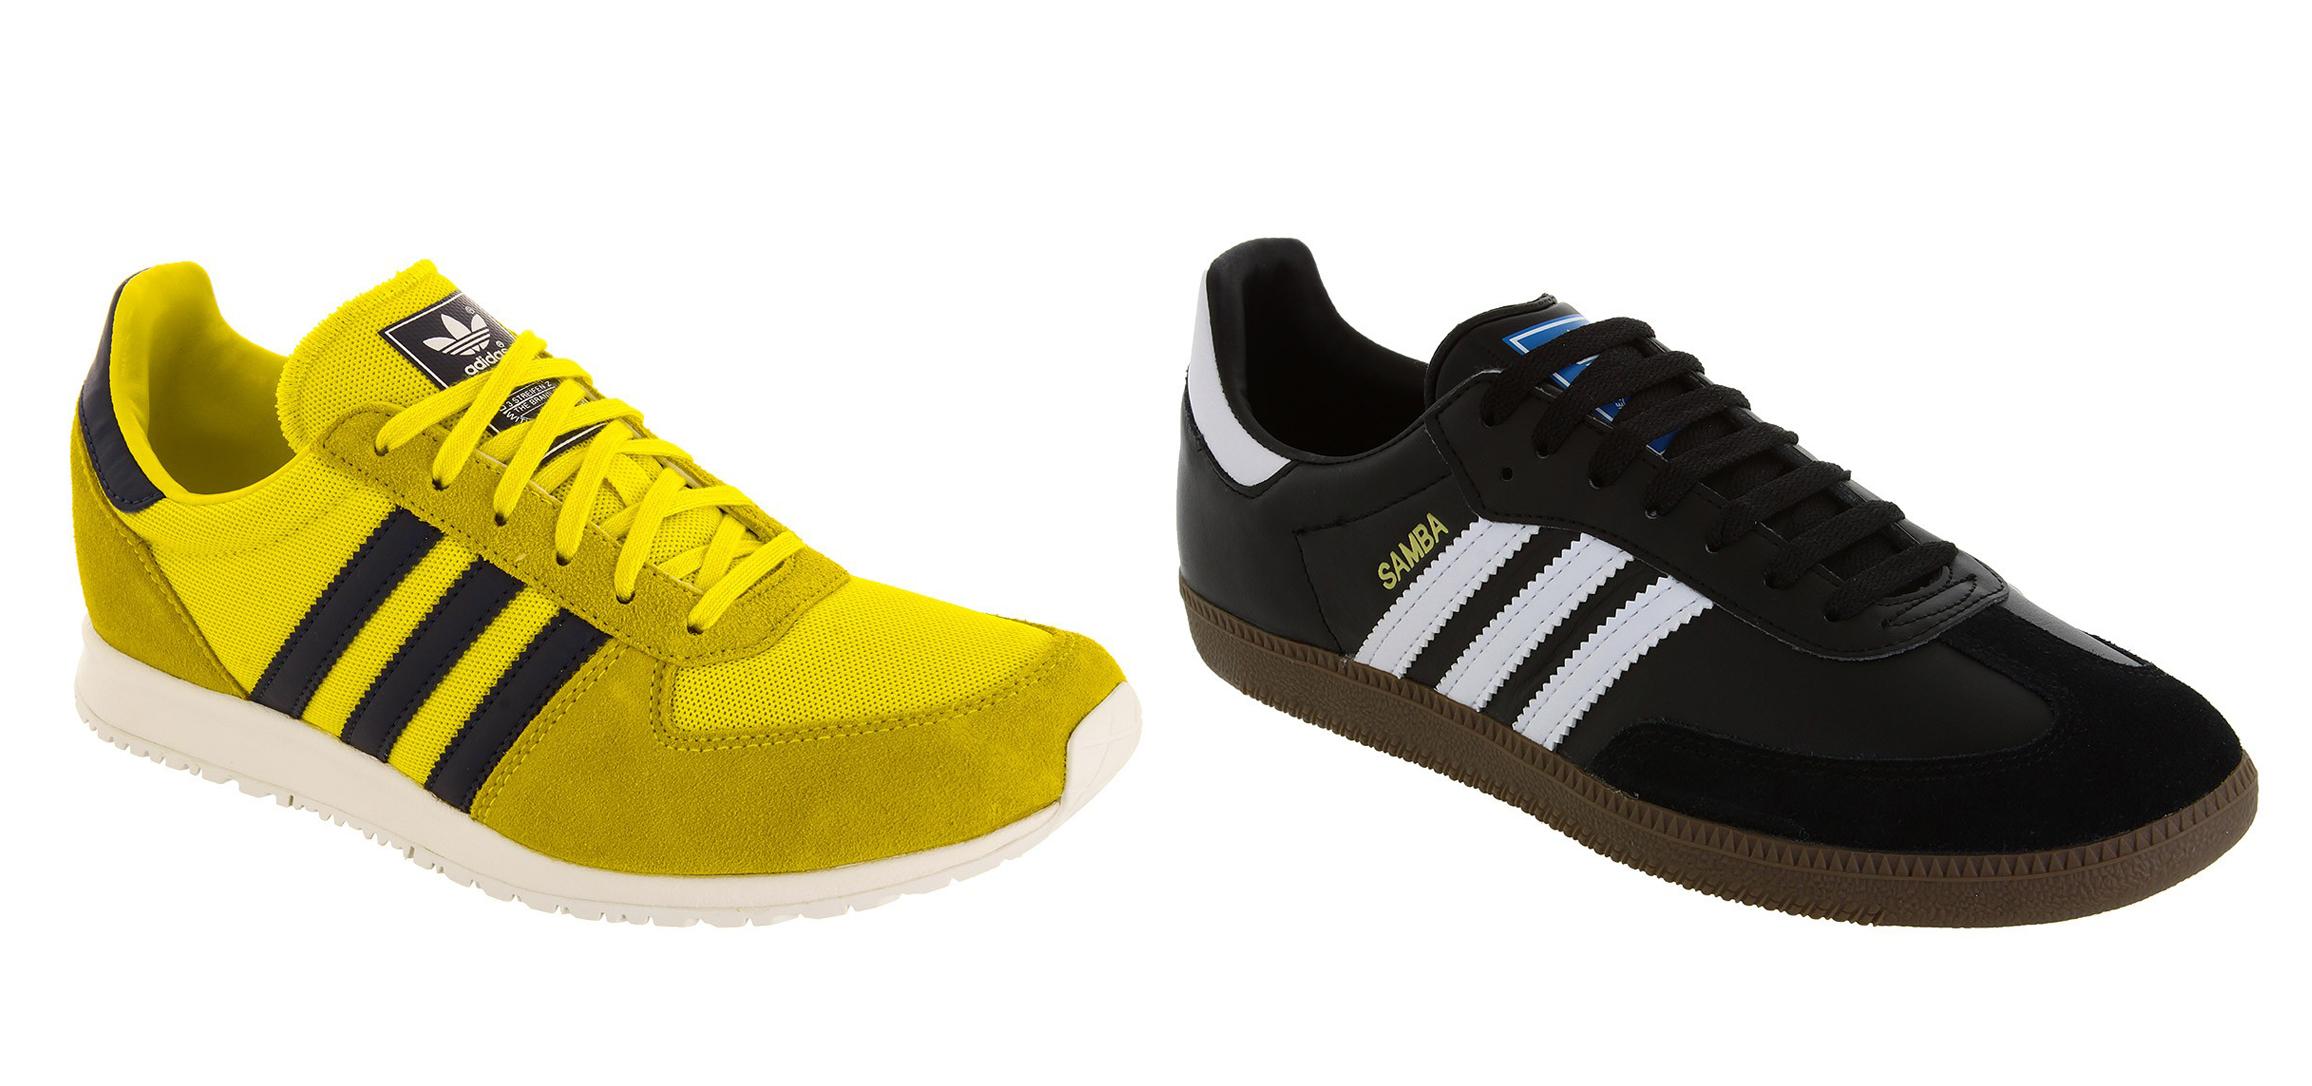 92b3ad116c014 ... Tenis adidas – World Tennis Classic